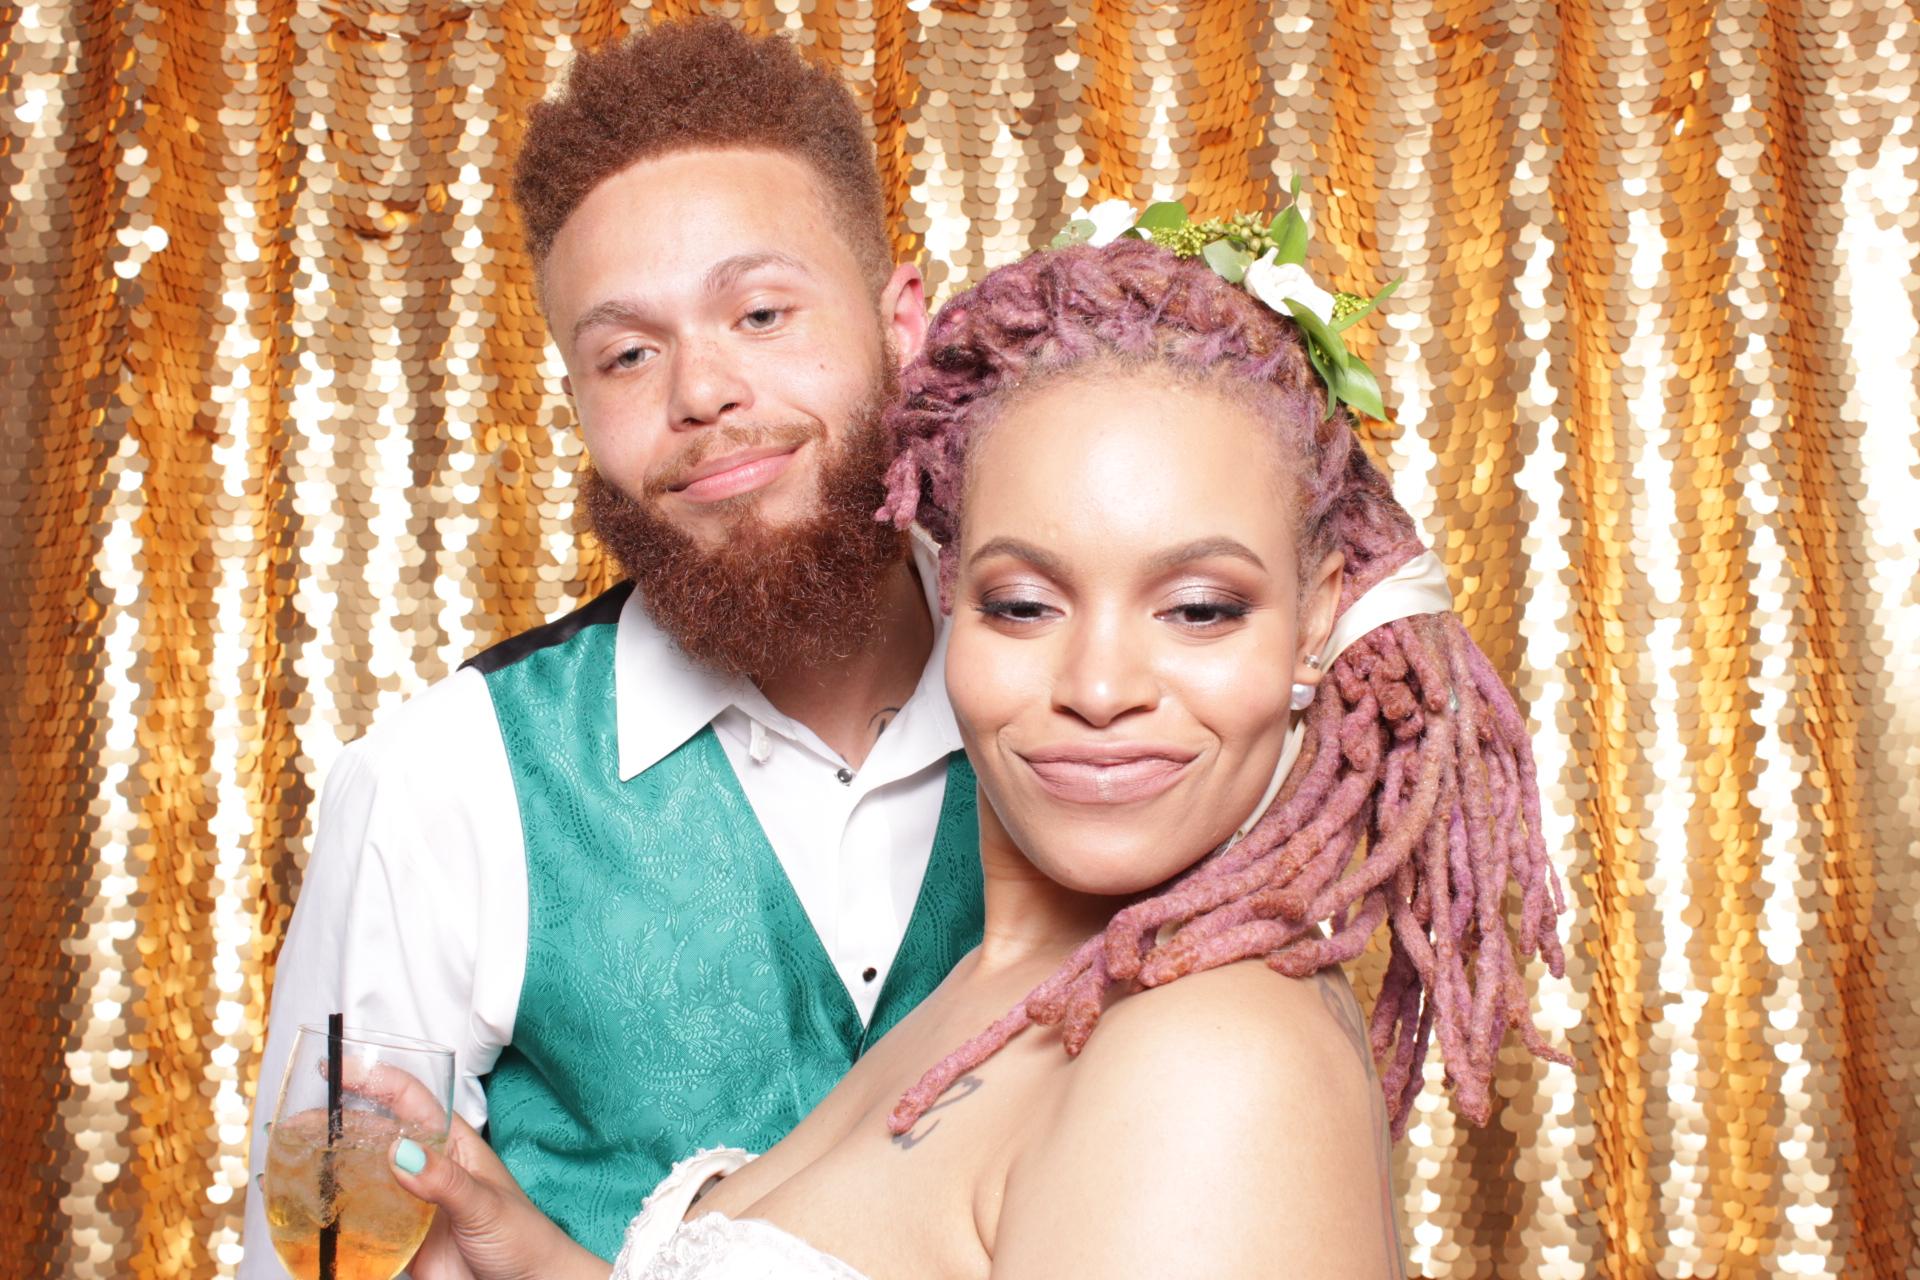 ATARA + JOSEPH WEDDING | HOT PINK PHOTO BOOTH